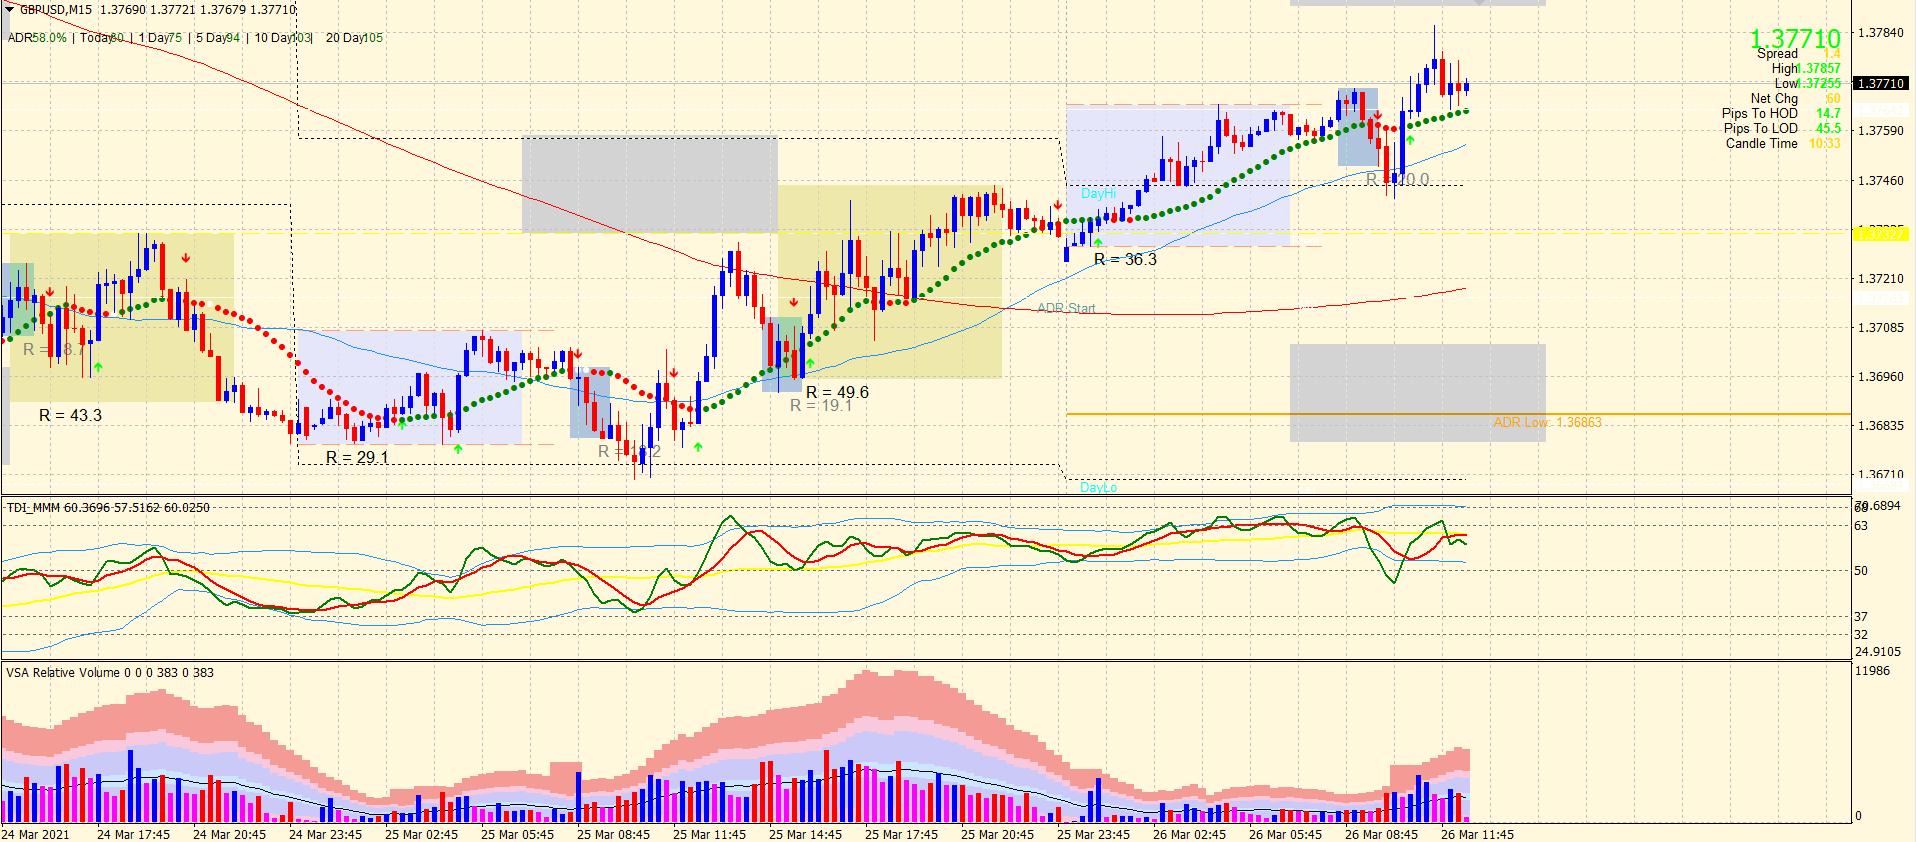 GBP/USD M15 Price Action